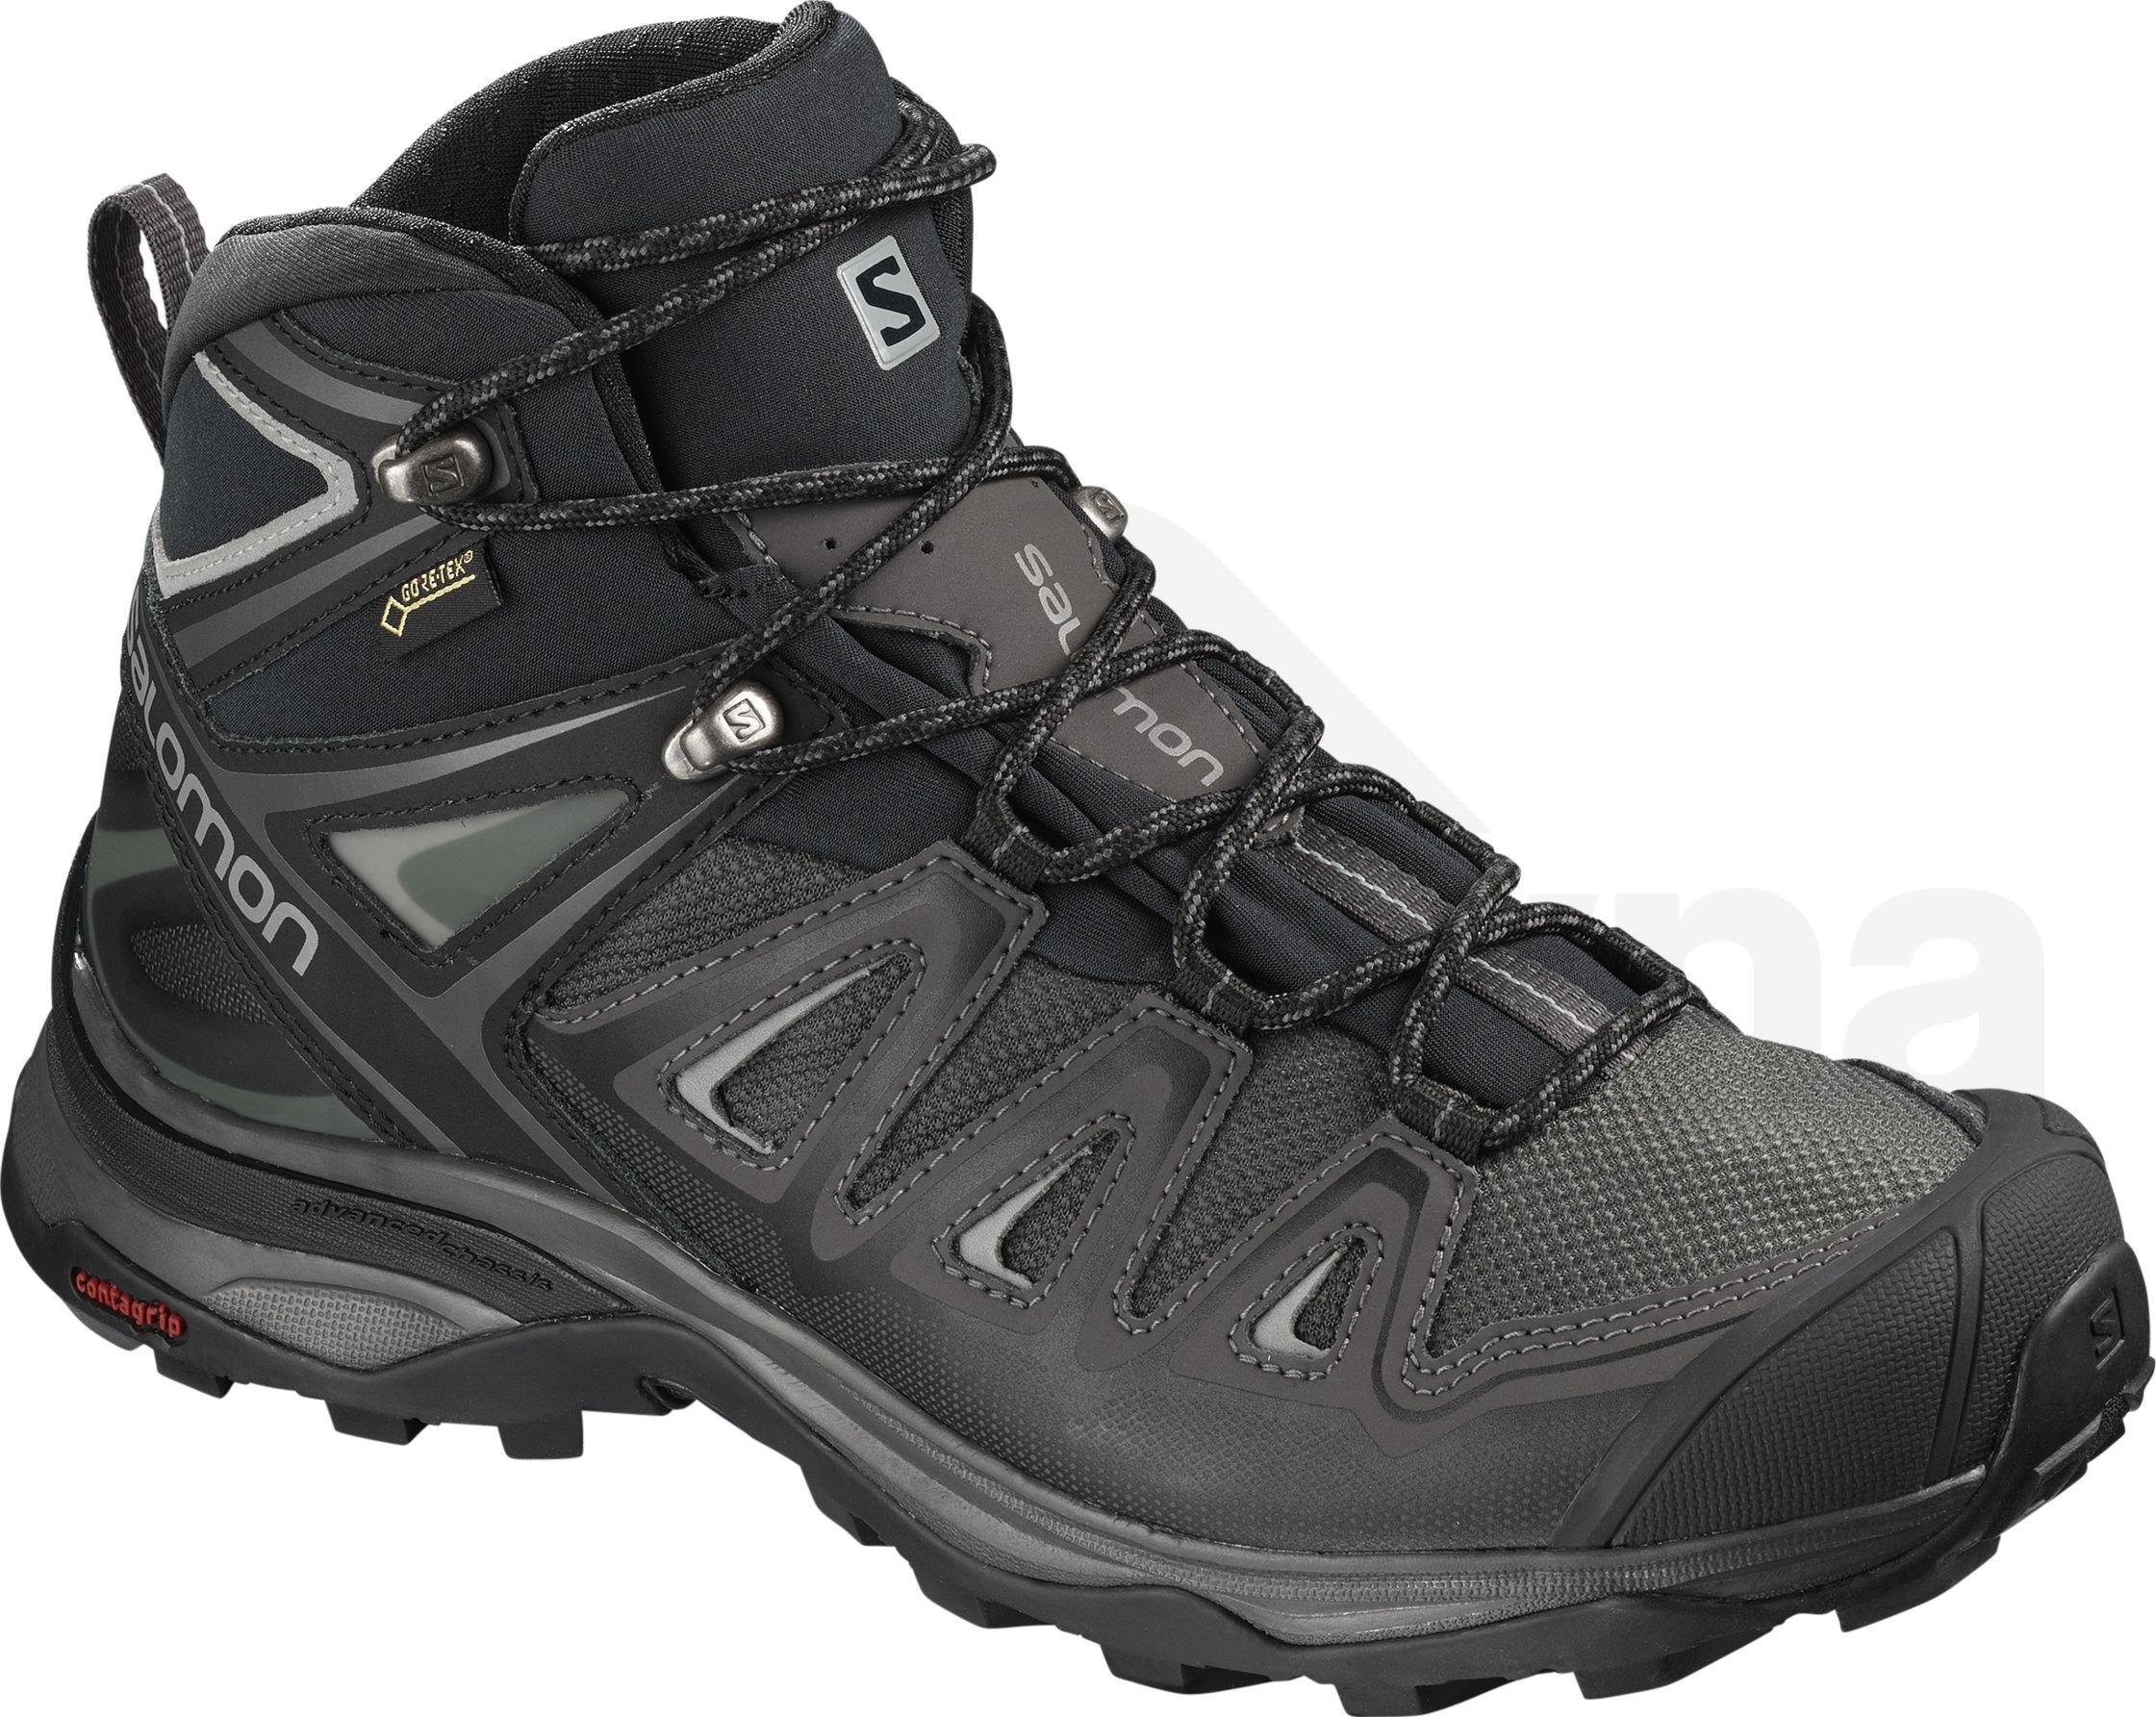 Dámská turistická obuv Salomon X ULTRA 3 MID GTX W Magnet Bk Monum ... 775c94668f